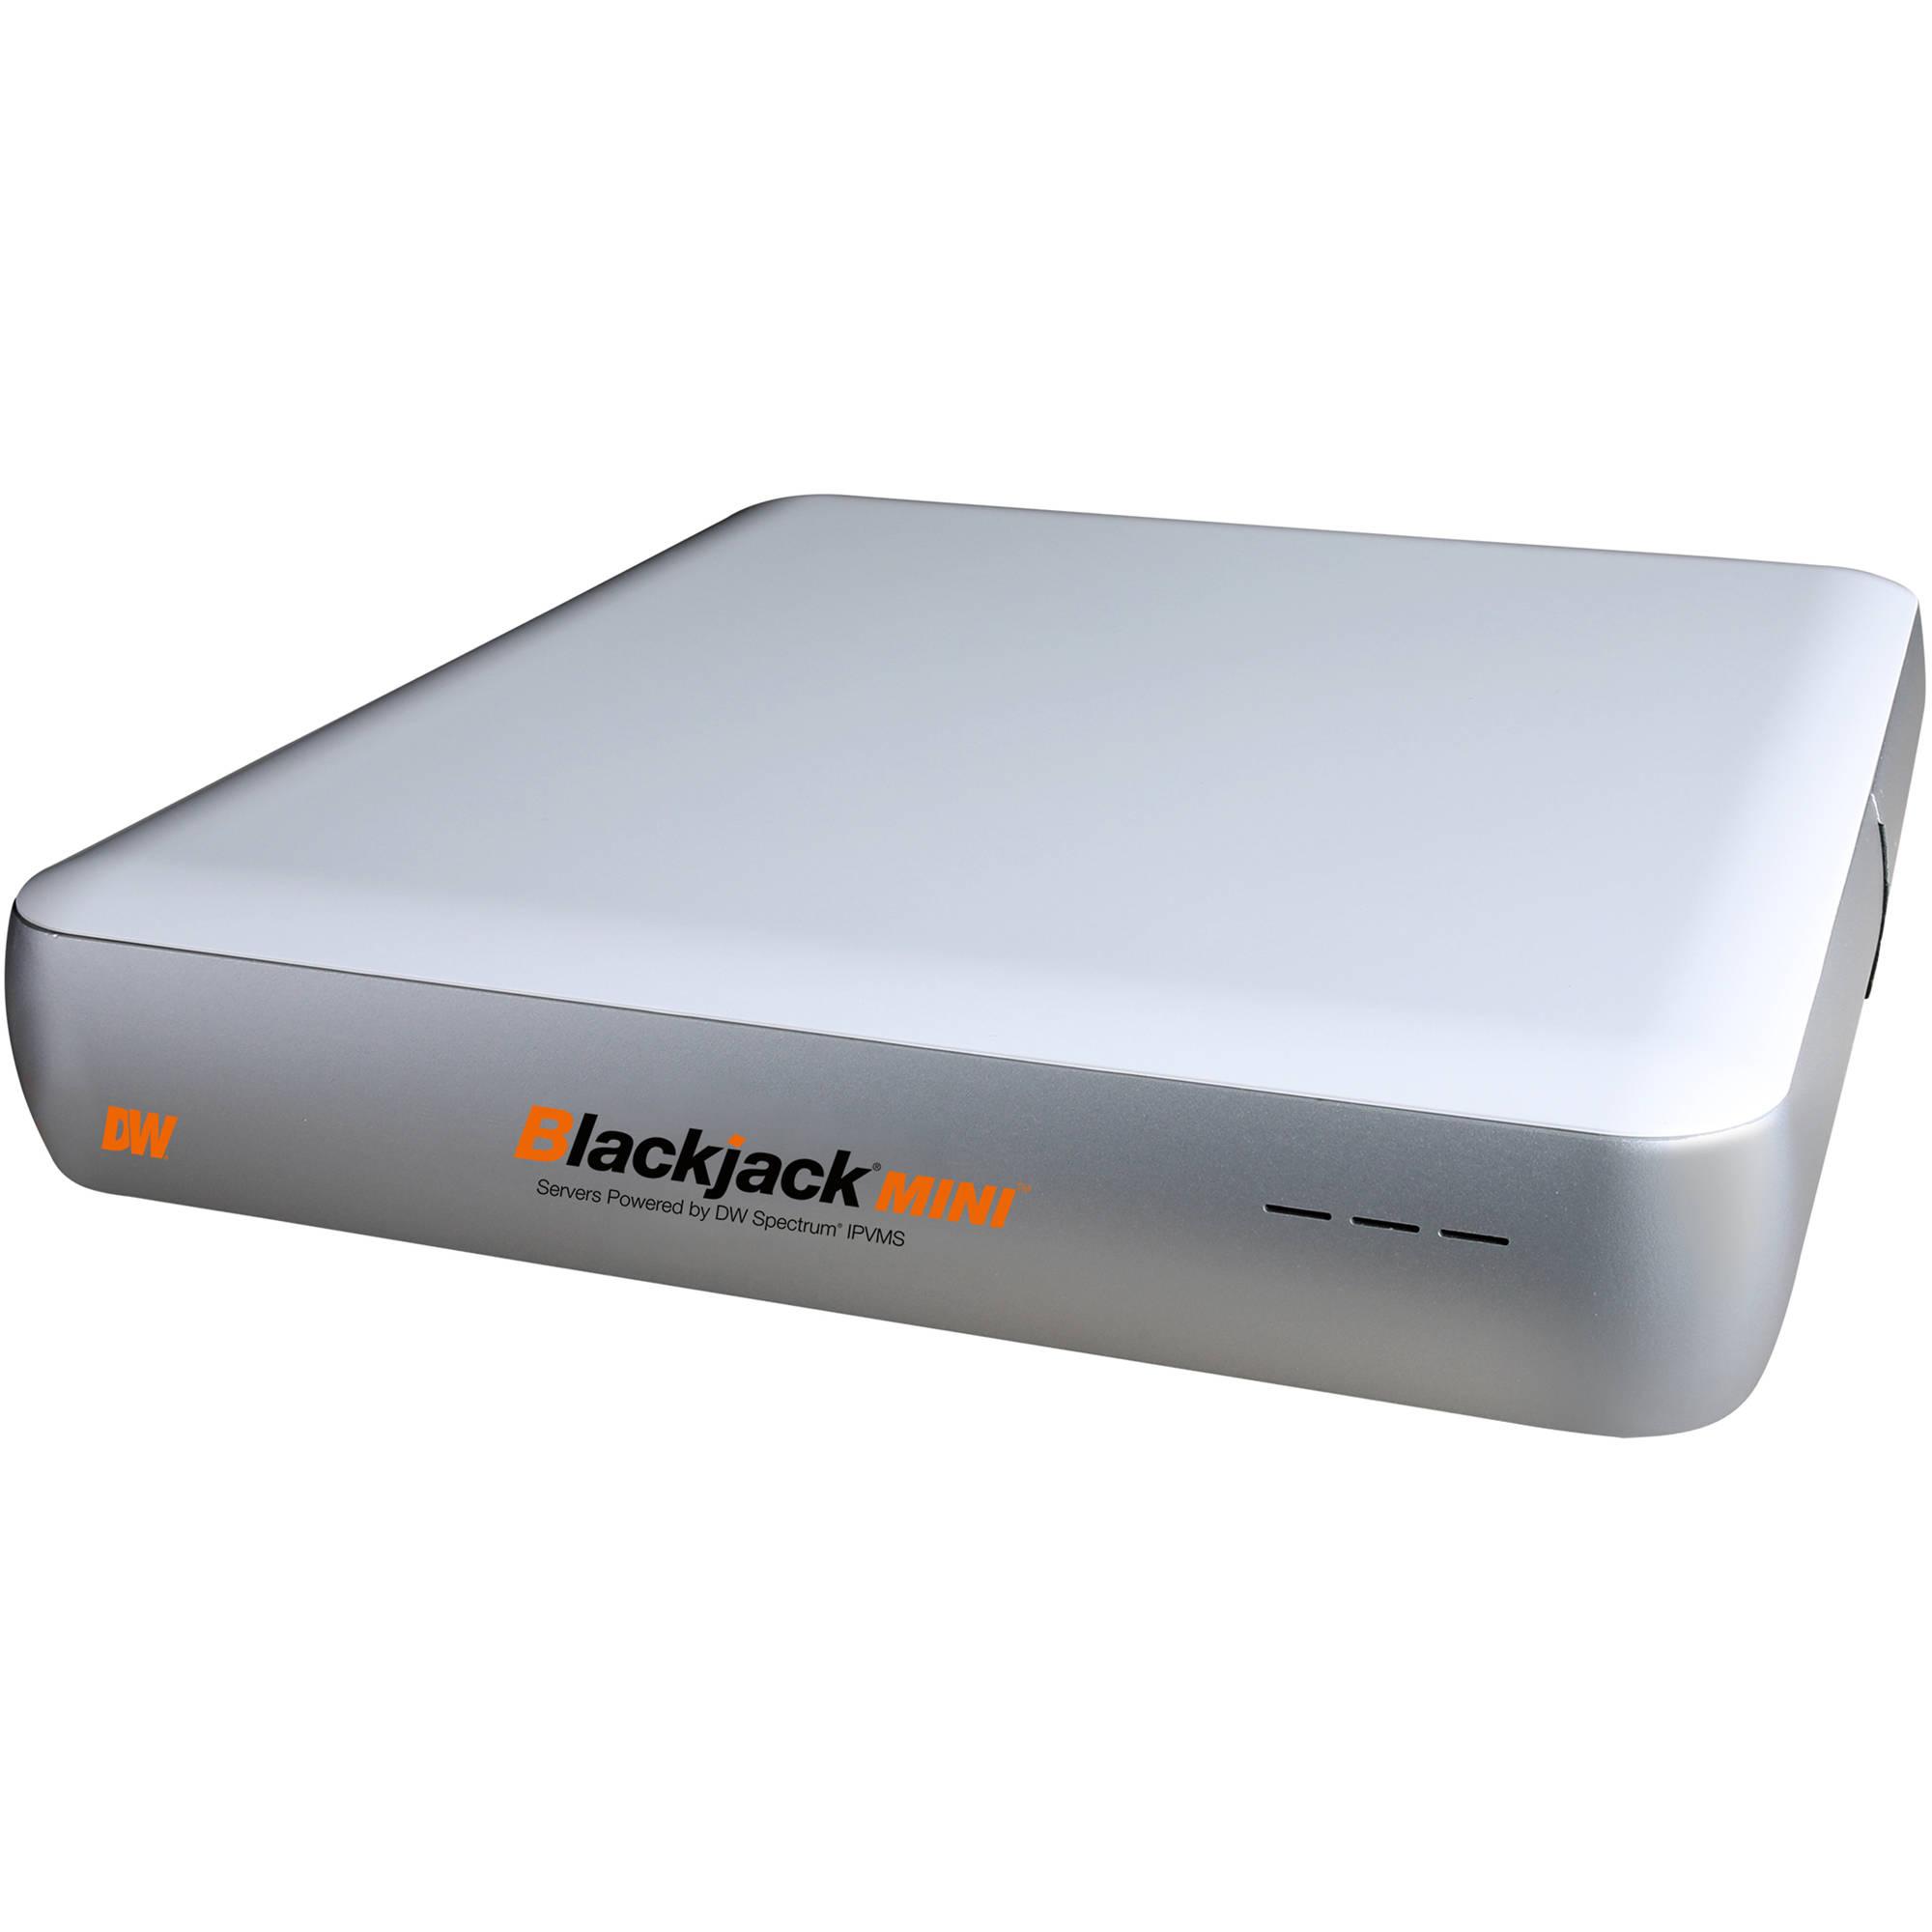 ab7c97b0ce digital watchdog dw bjmini20t blackjack mini nvr server 1423561.jpg